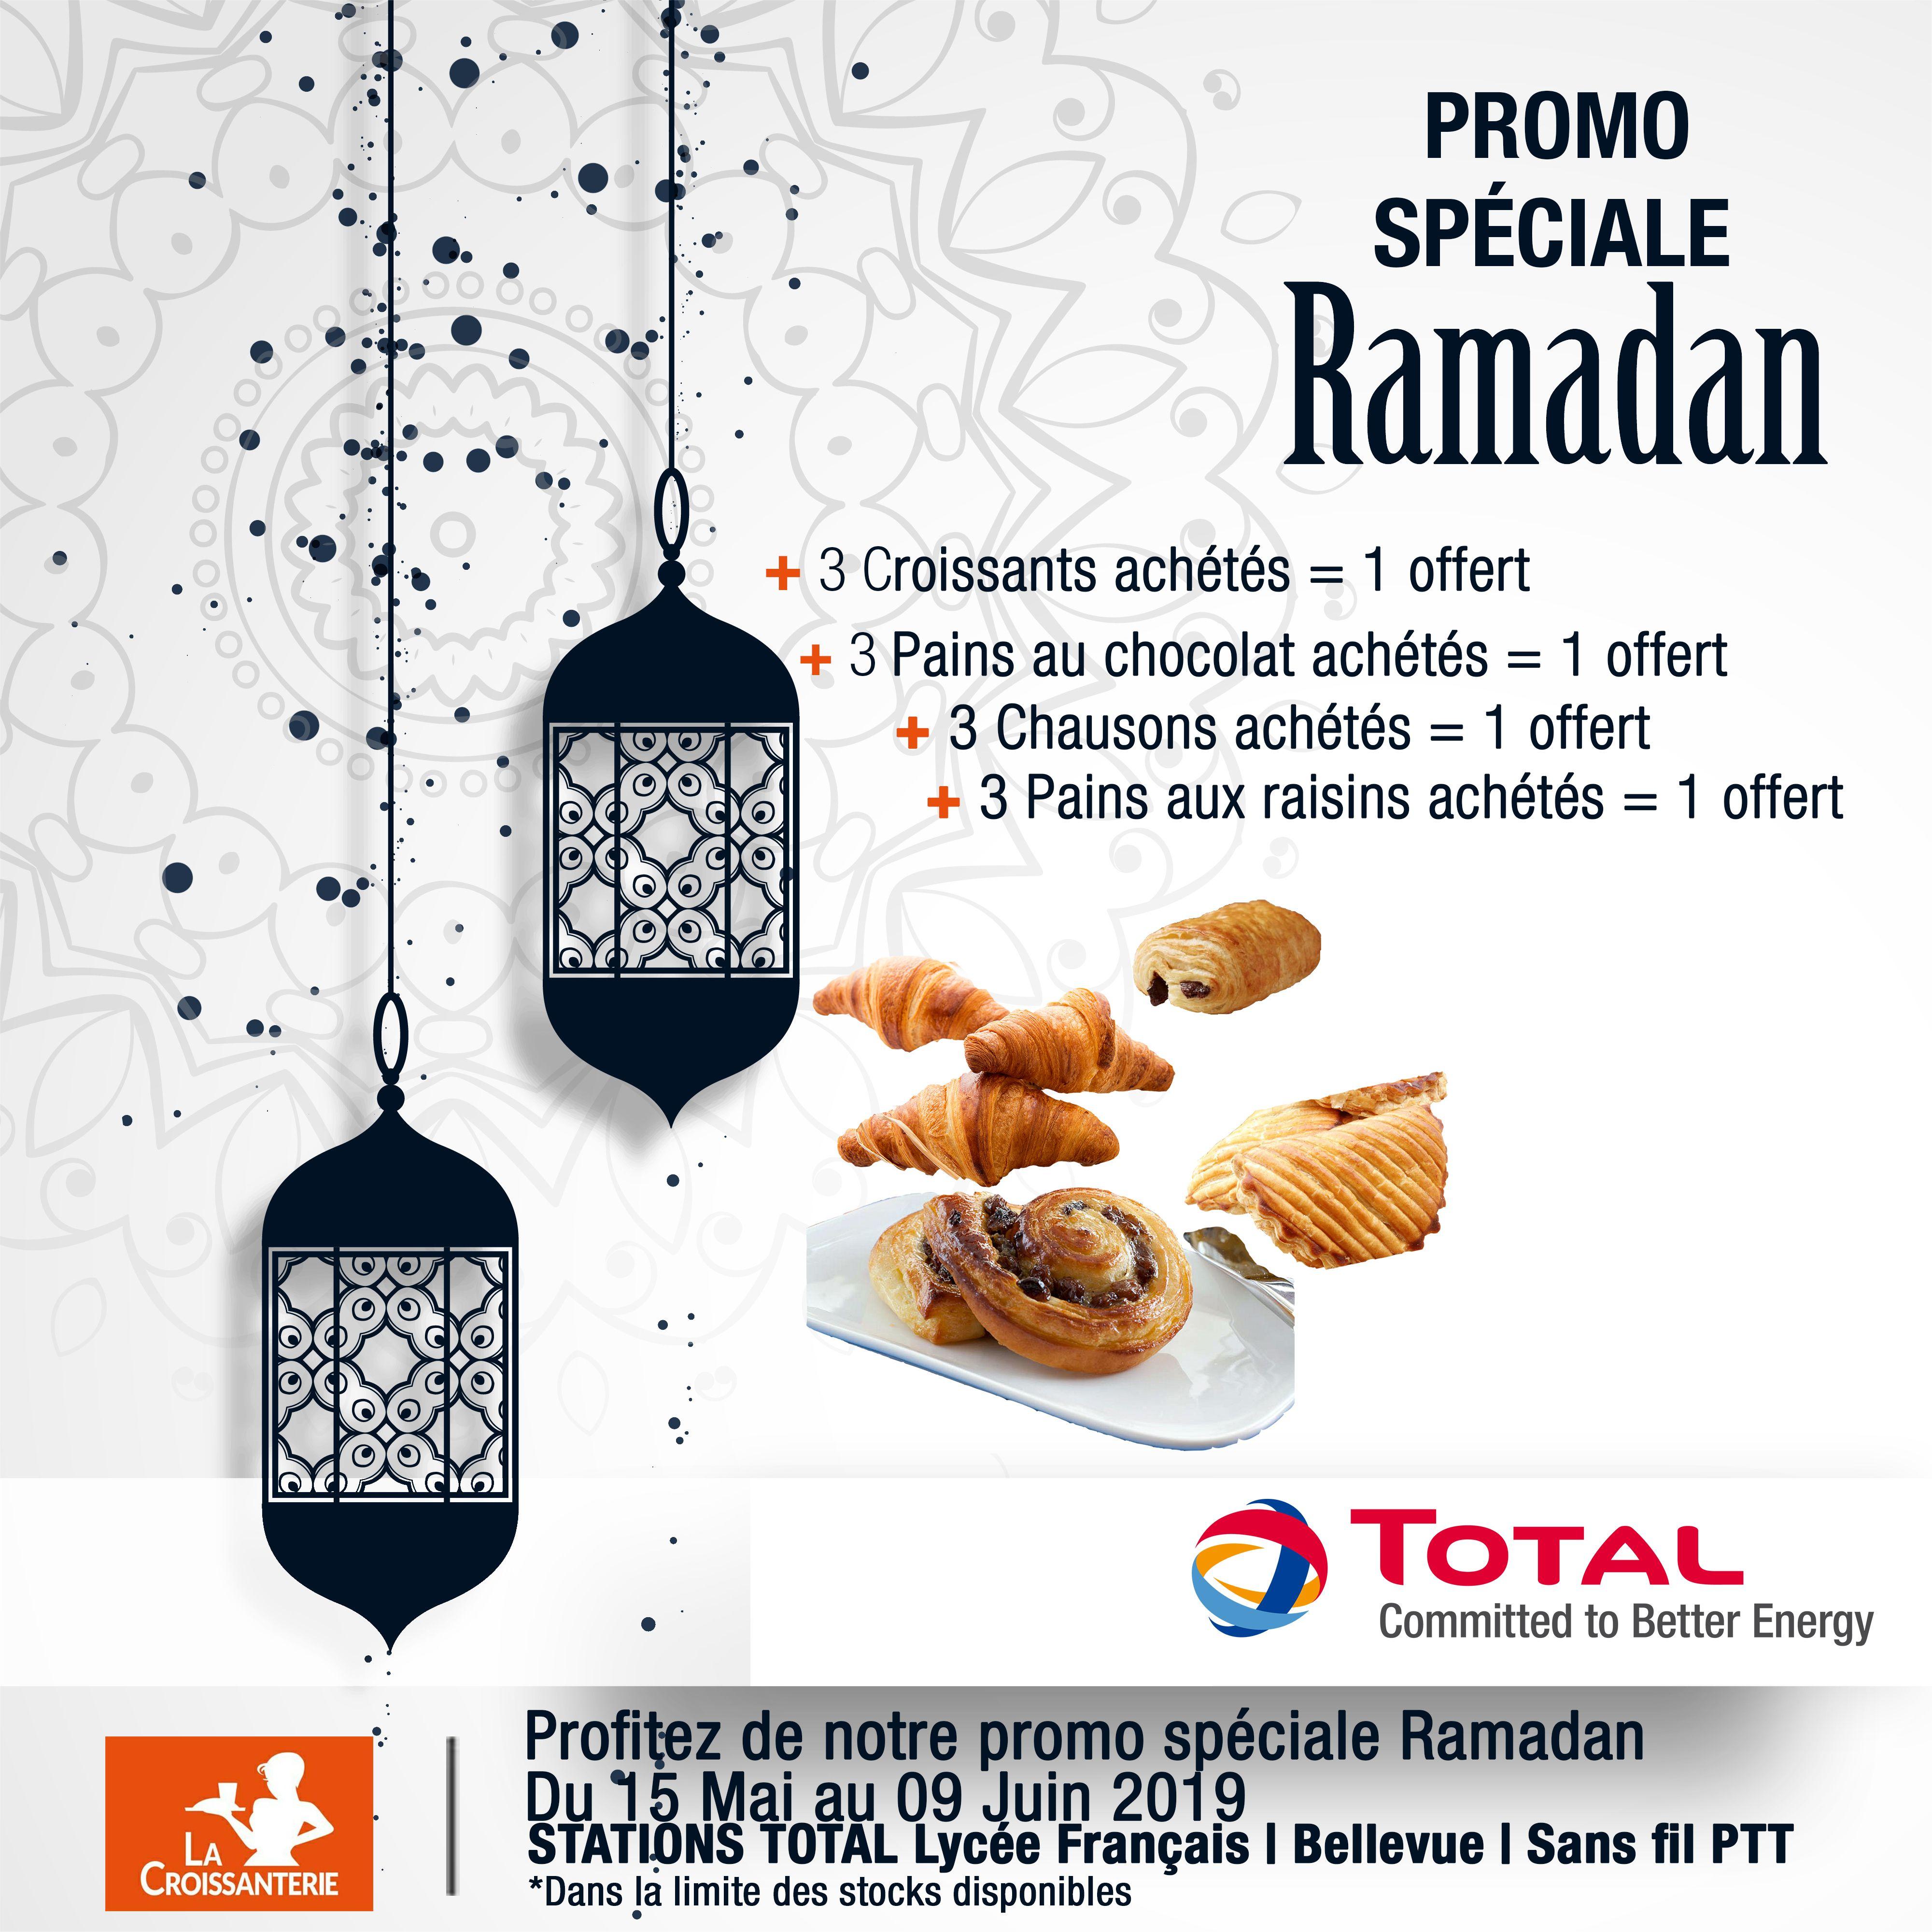 promo_ramadan_croissanterie_2019.jpg